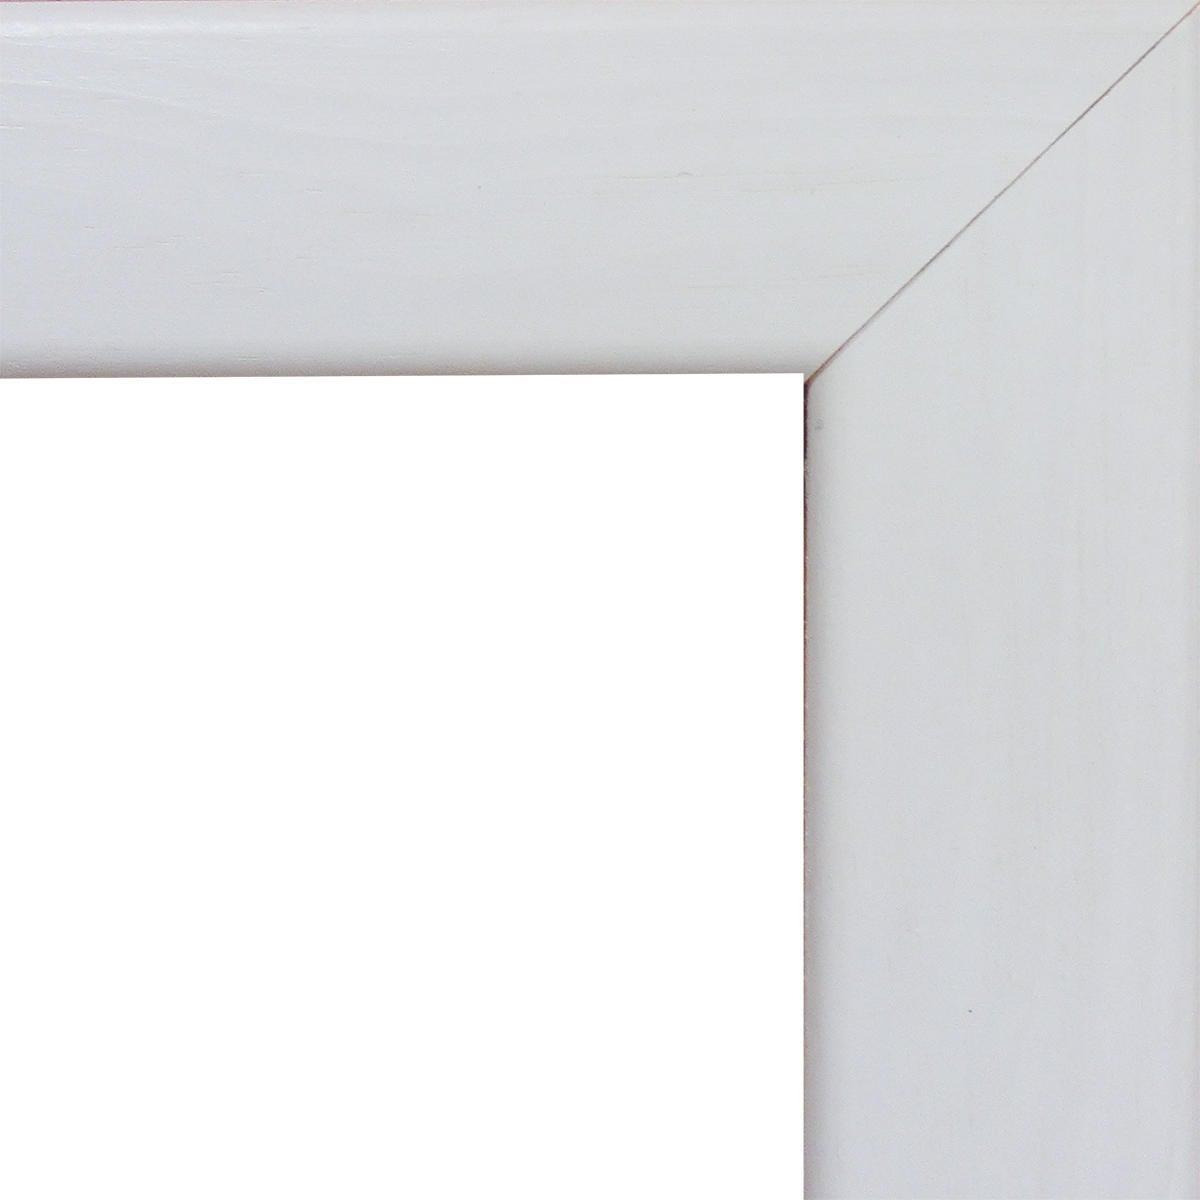 Cornice INSPIRE Pulp bianco per foto da 70x100 cm - 7